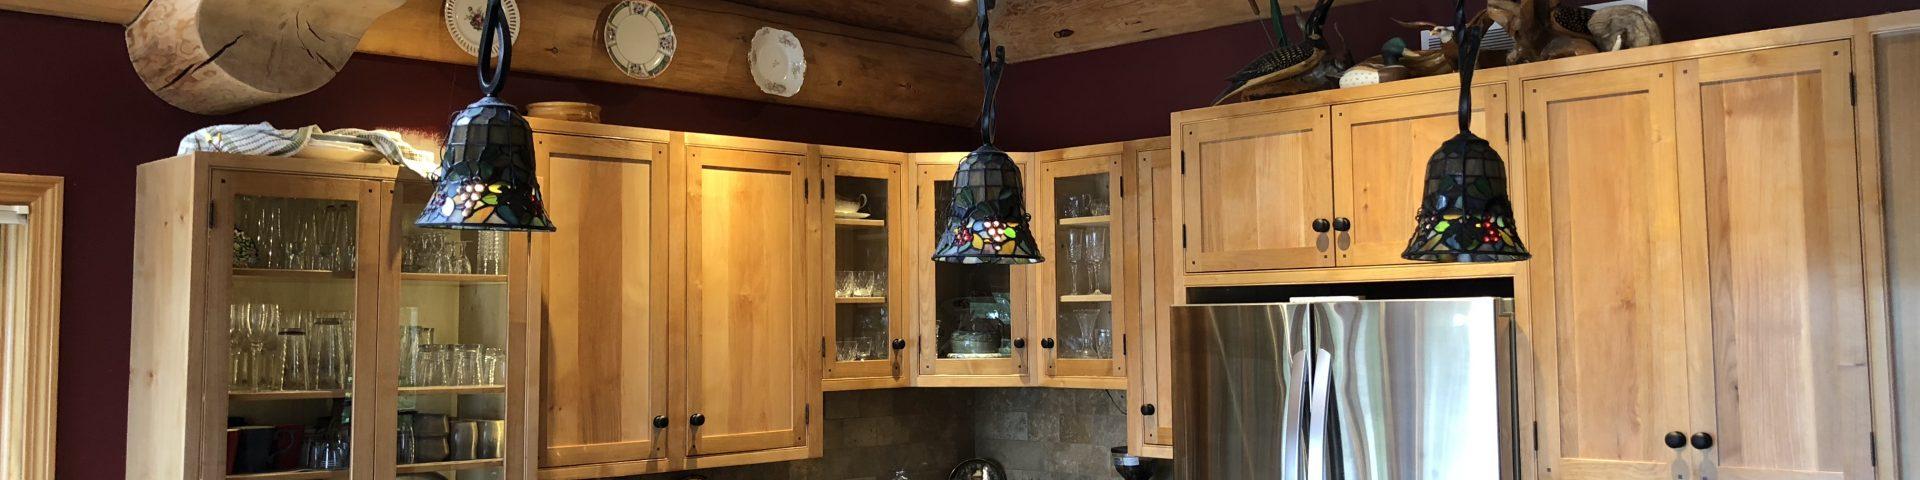 Pacific Red Alder – Kitchen Cabinets – COASTWOOD